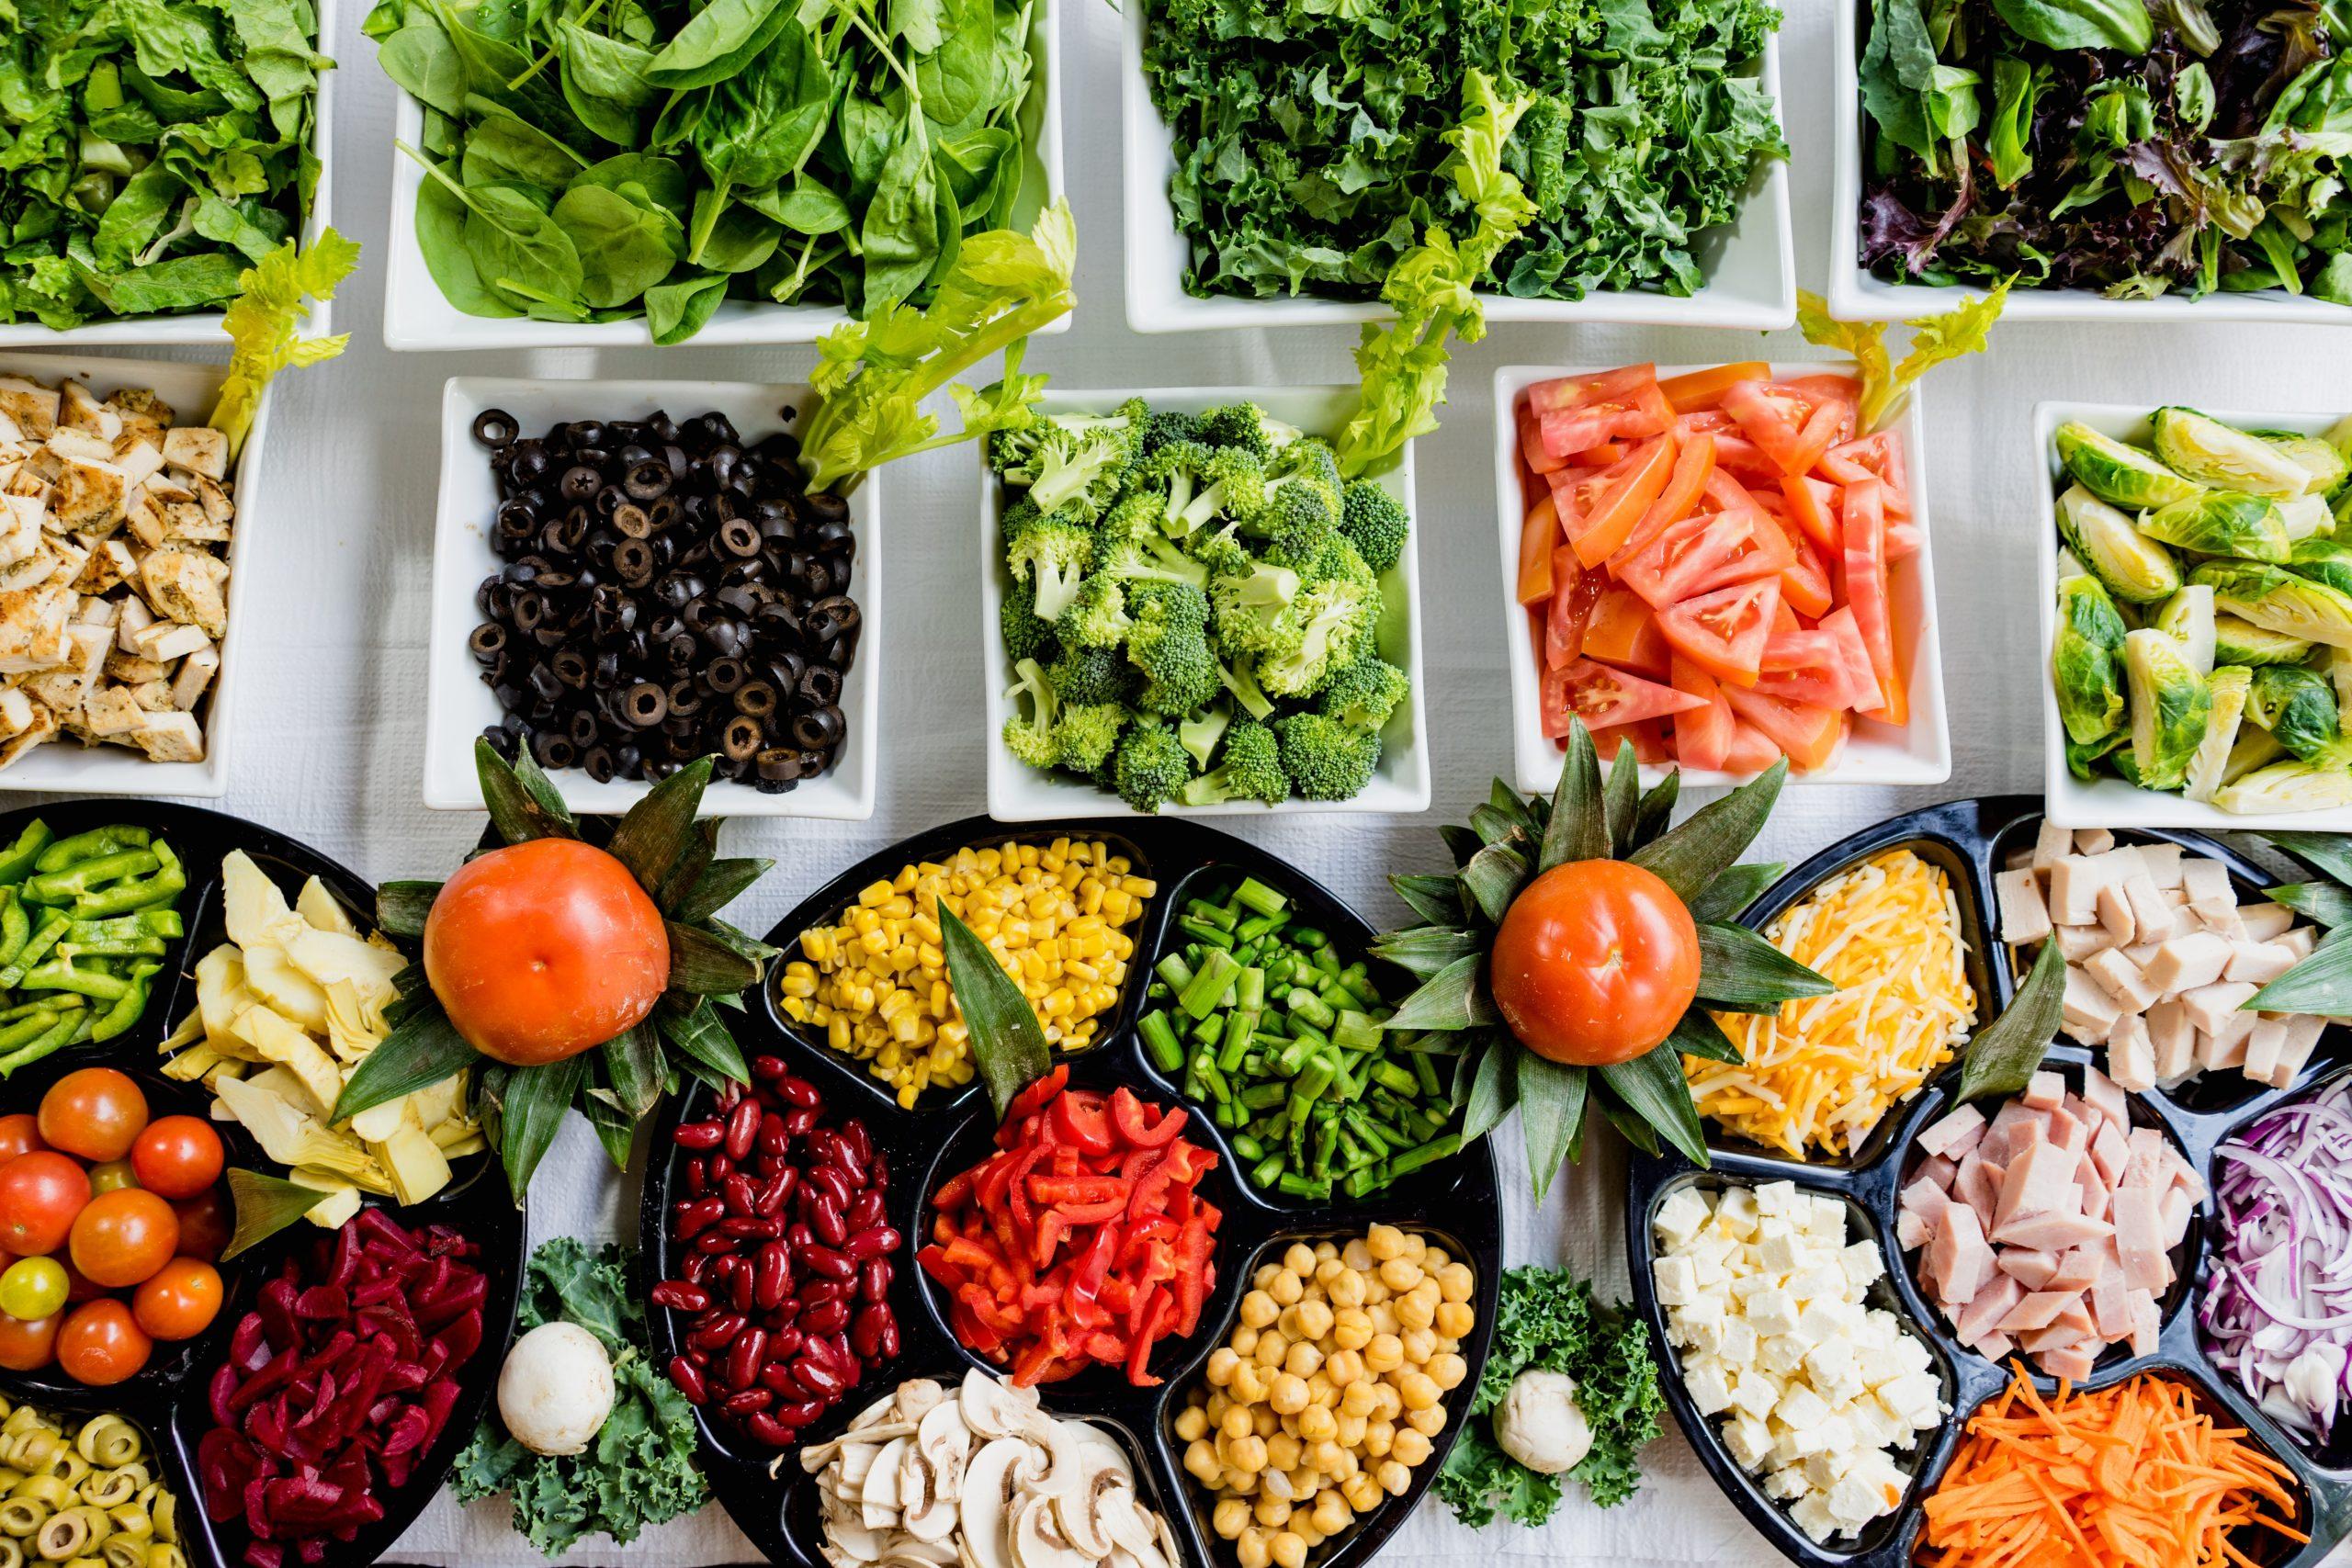 Summer Food Programs in WNC